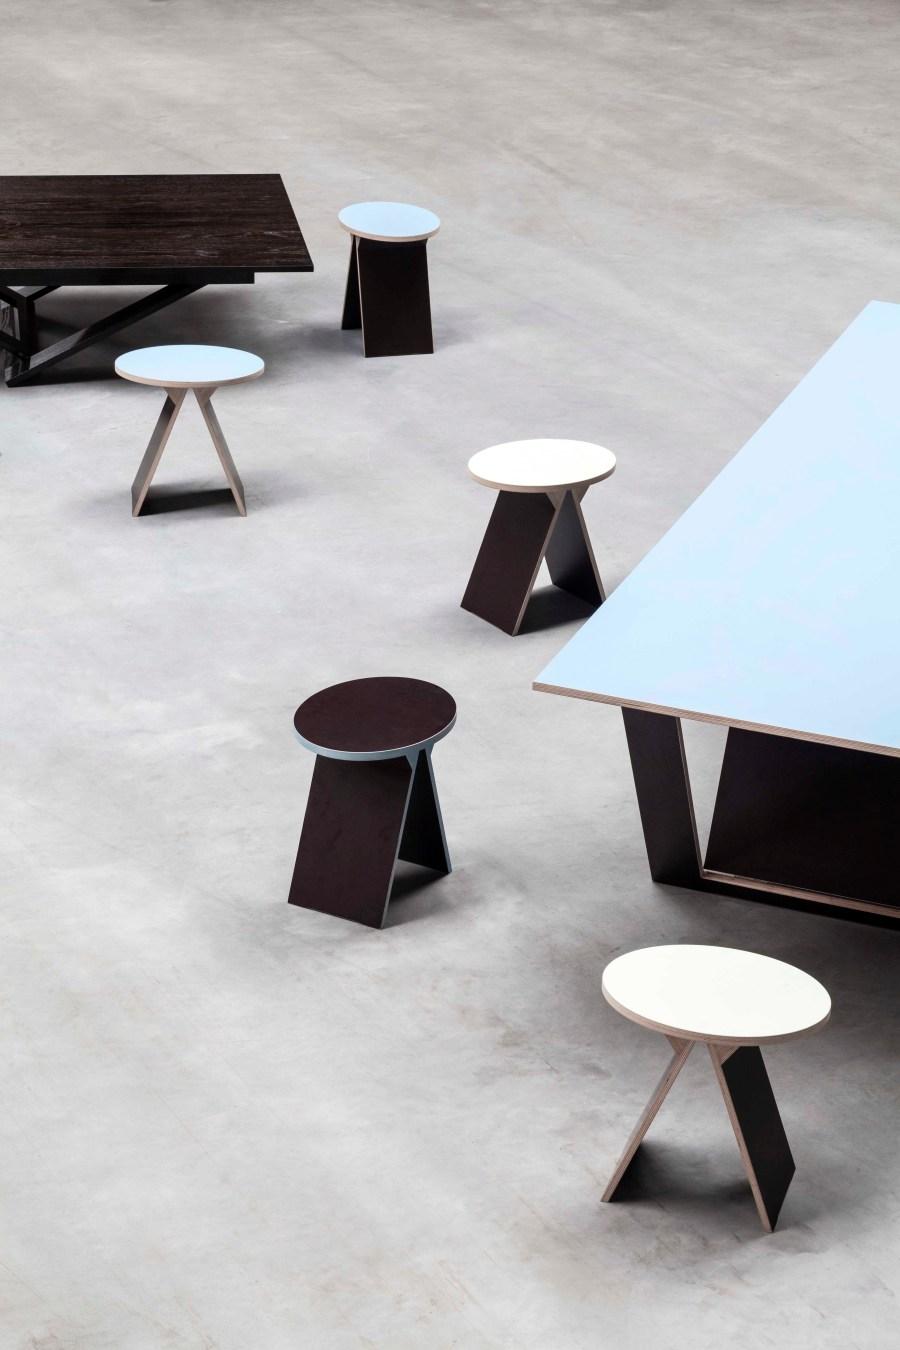 Robbrecht en Daem architecten furniture for Valerie Objects